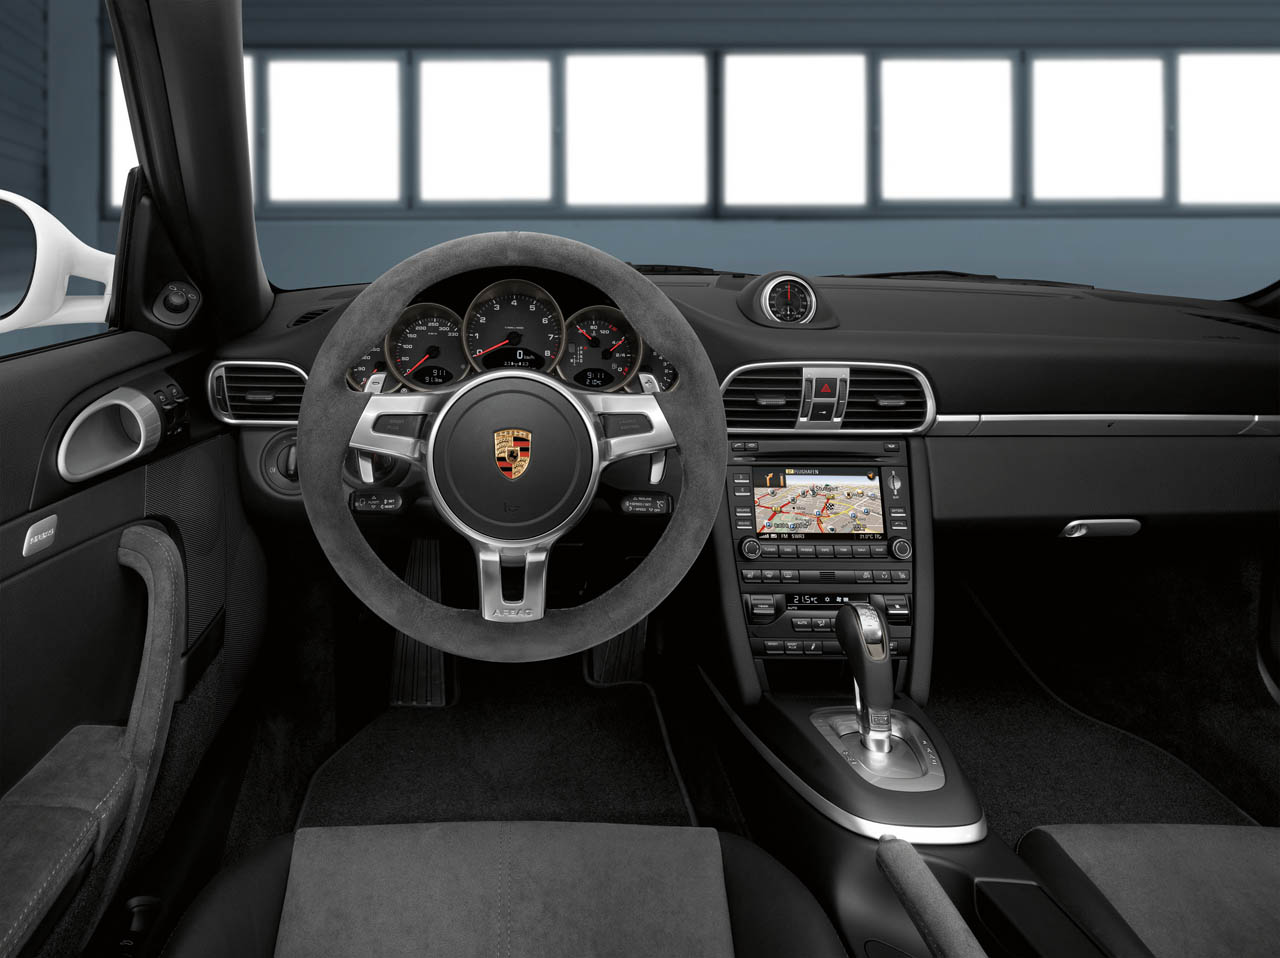 2011 Porsche Carrera GTS Interior